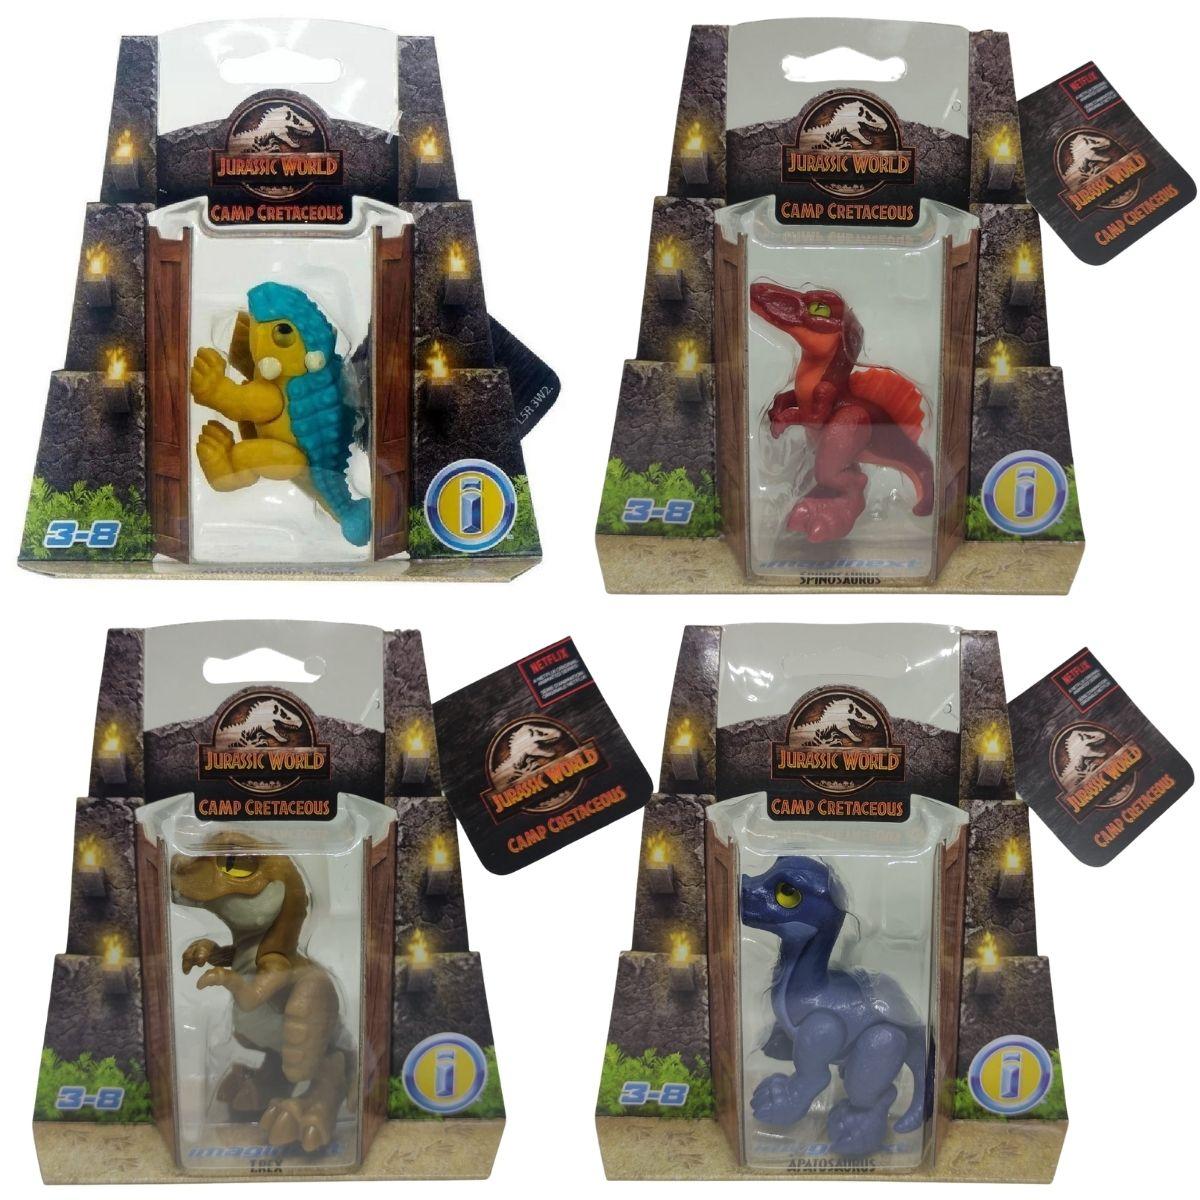 Dinossauro Bebe Jurassic World - Pack com 4 Figuras - Mattel